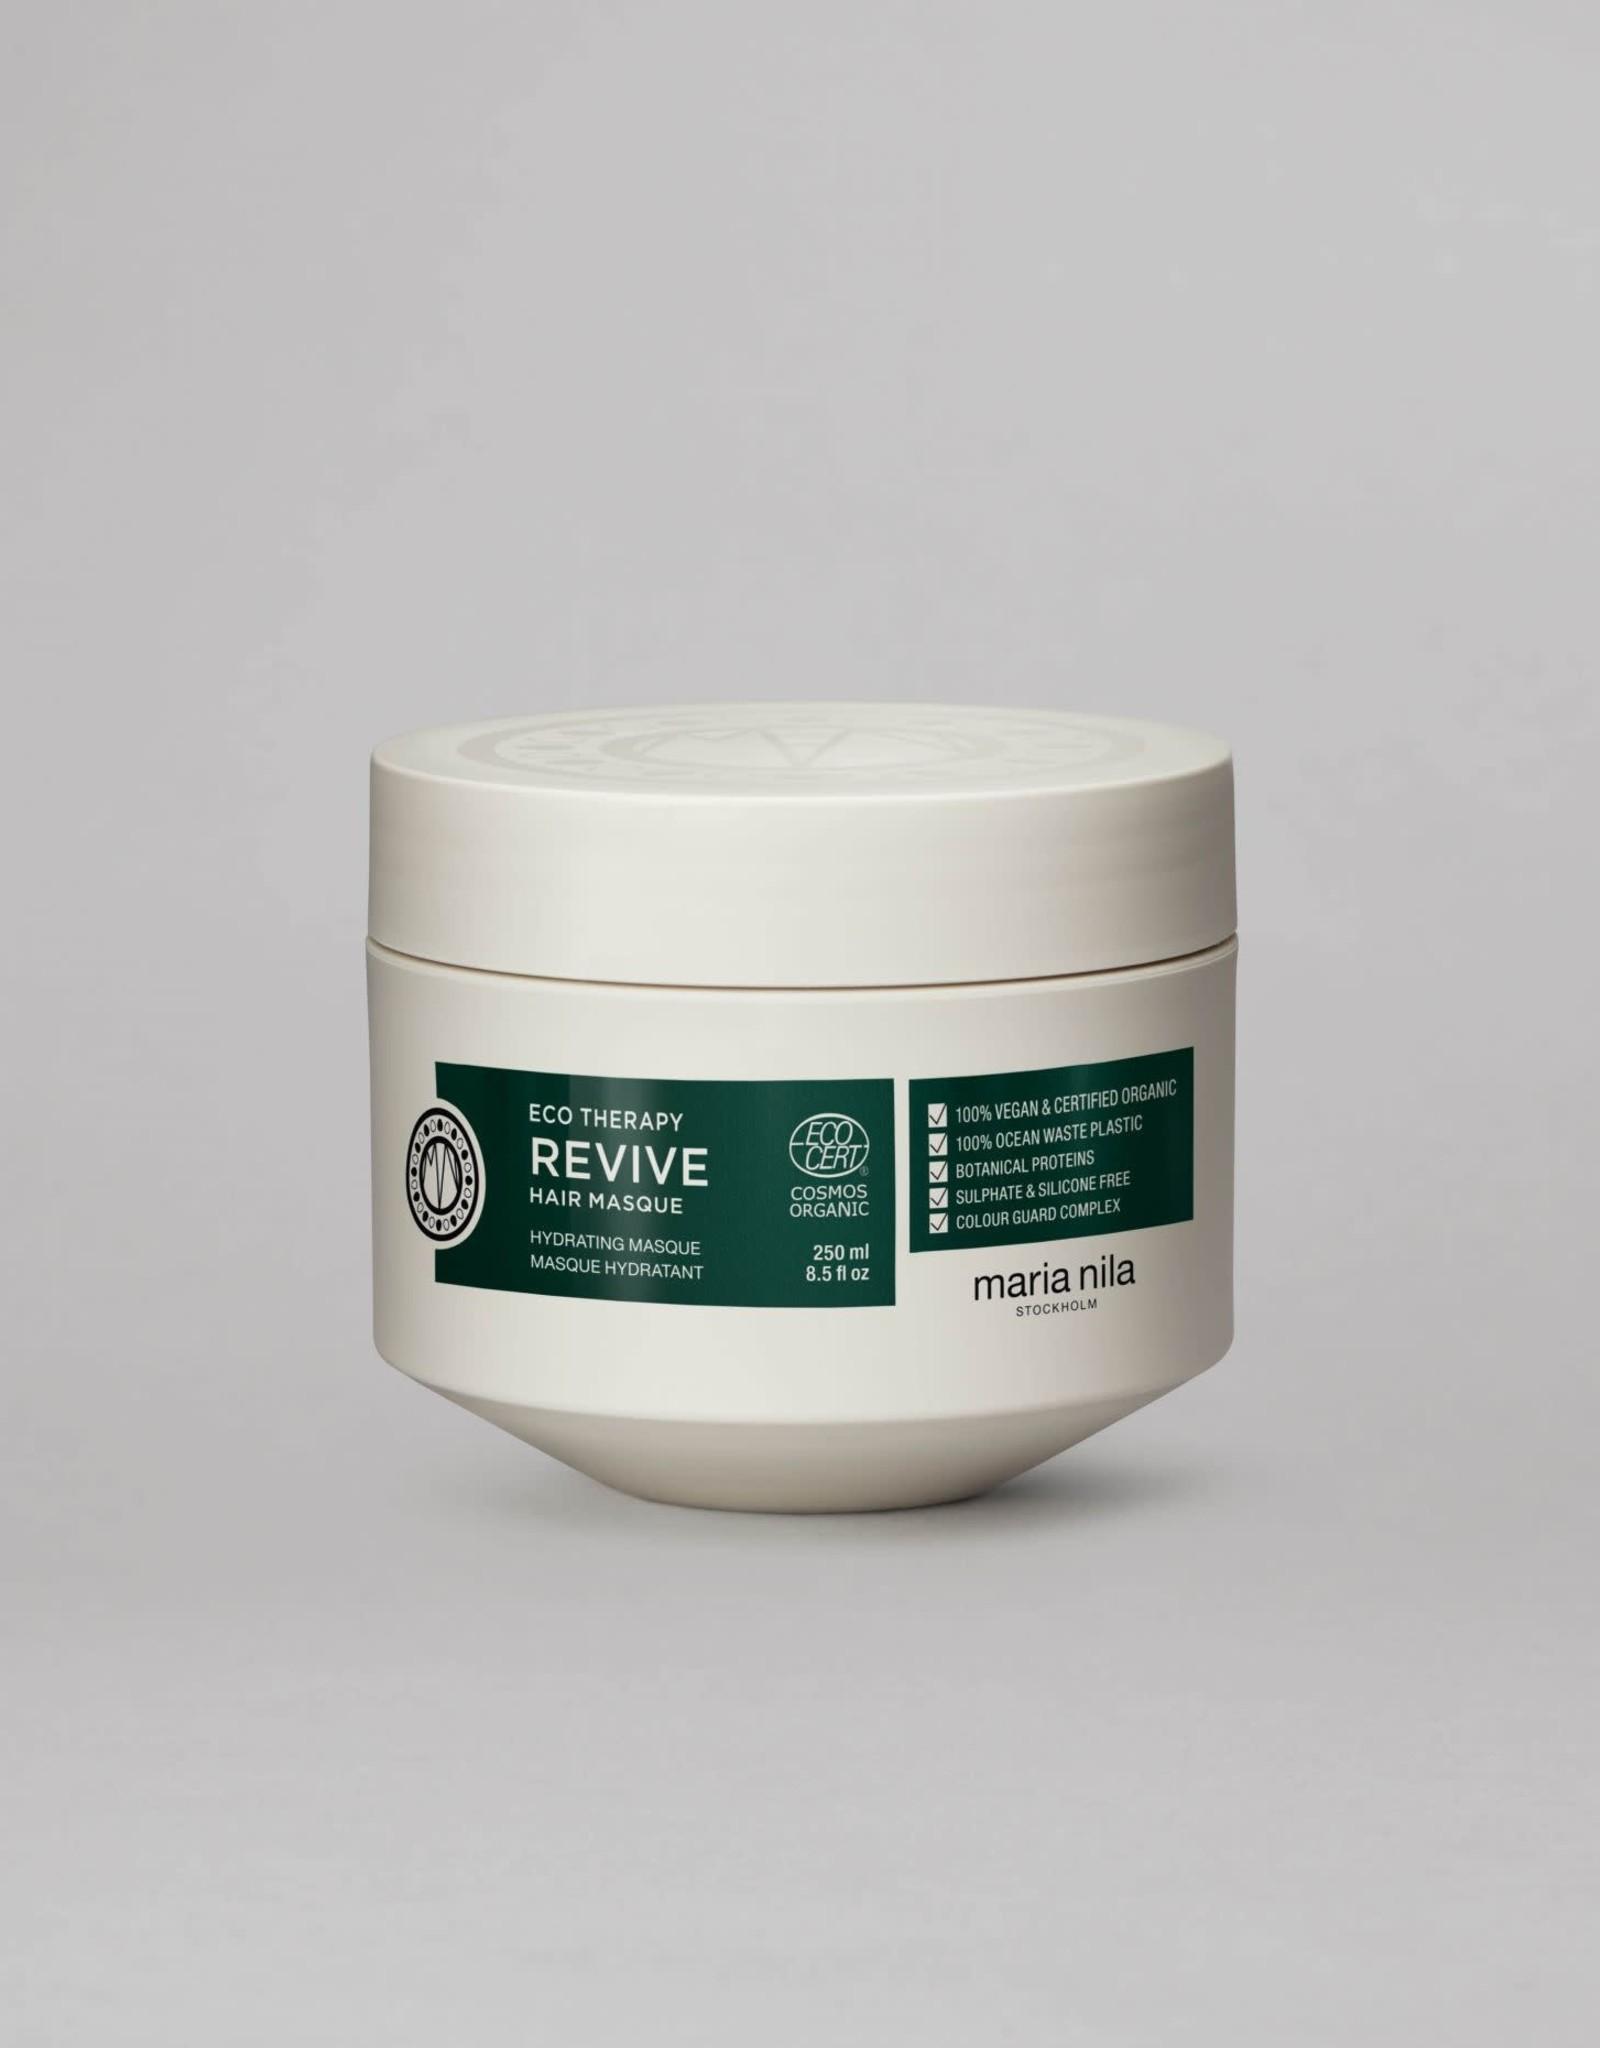 Maria Nila Eco Therapy Revive Hair Masque 250ml